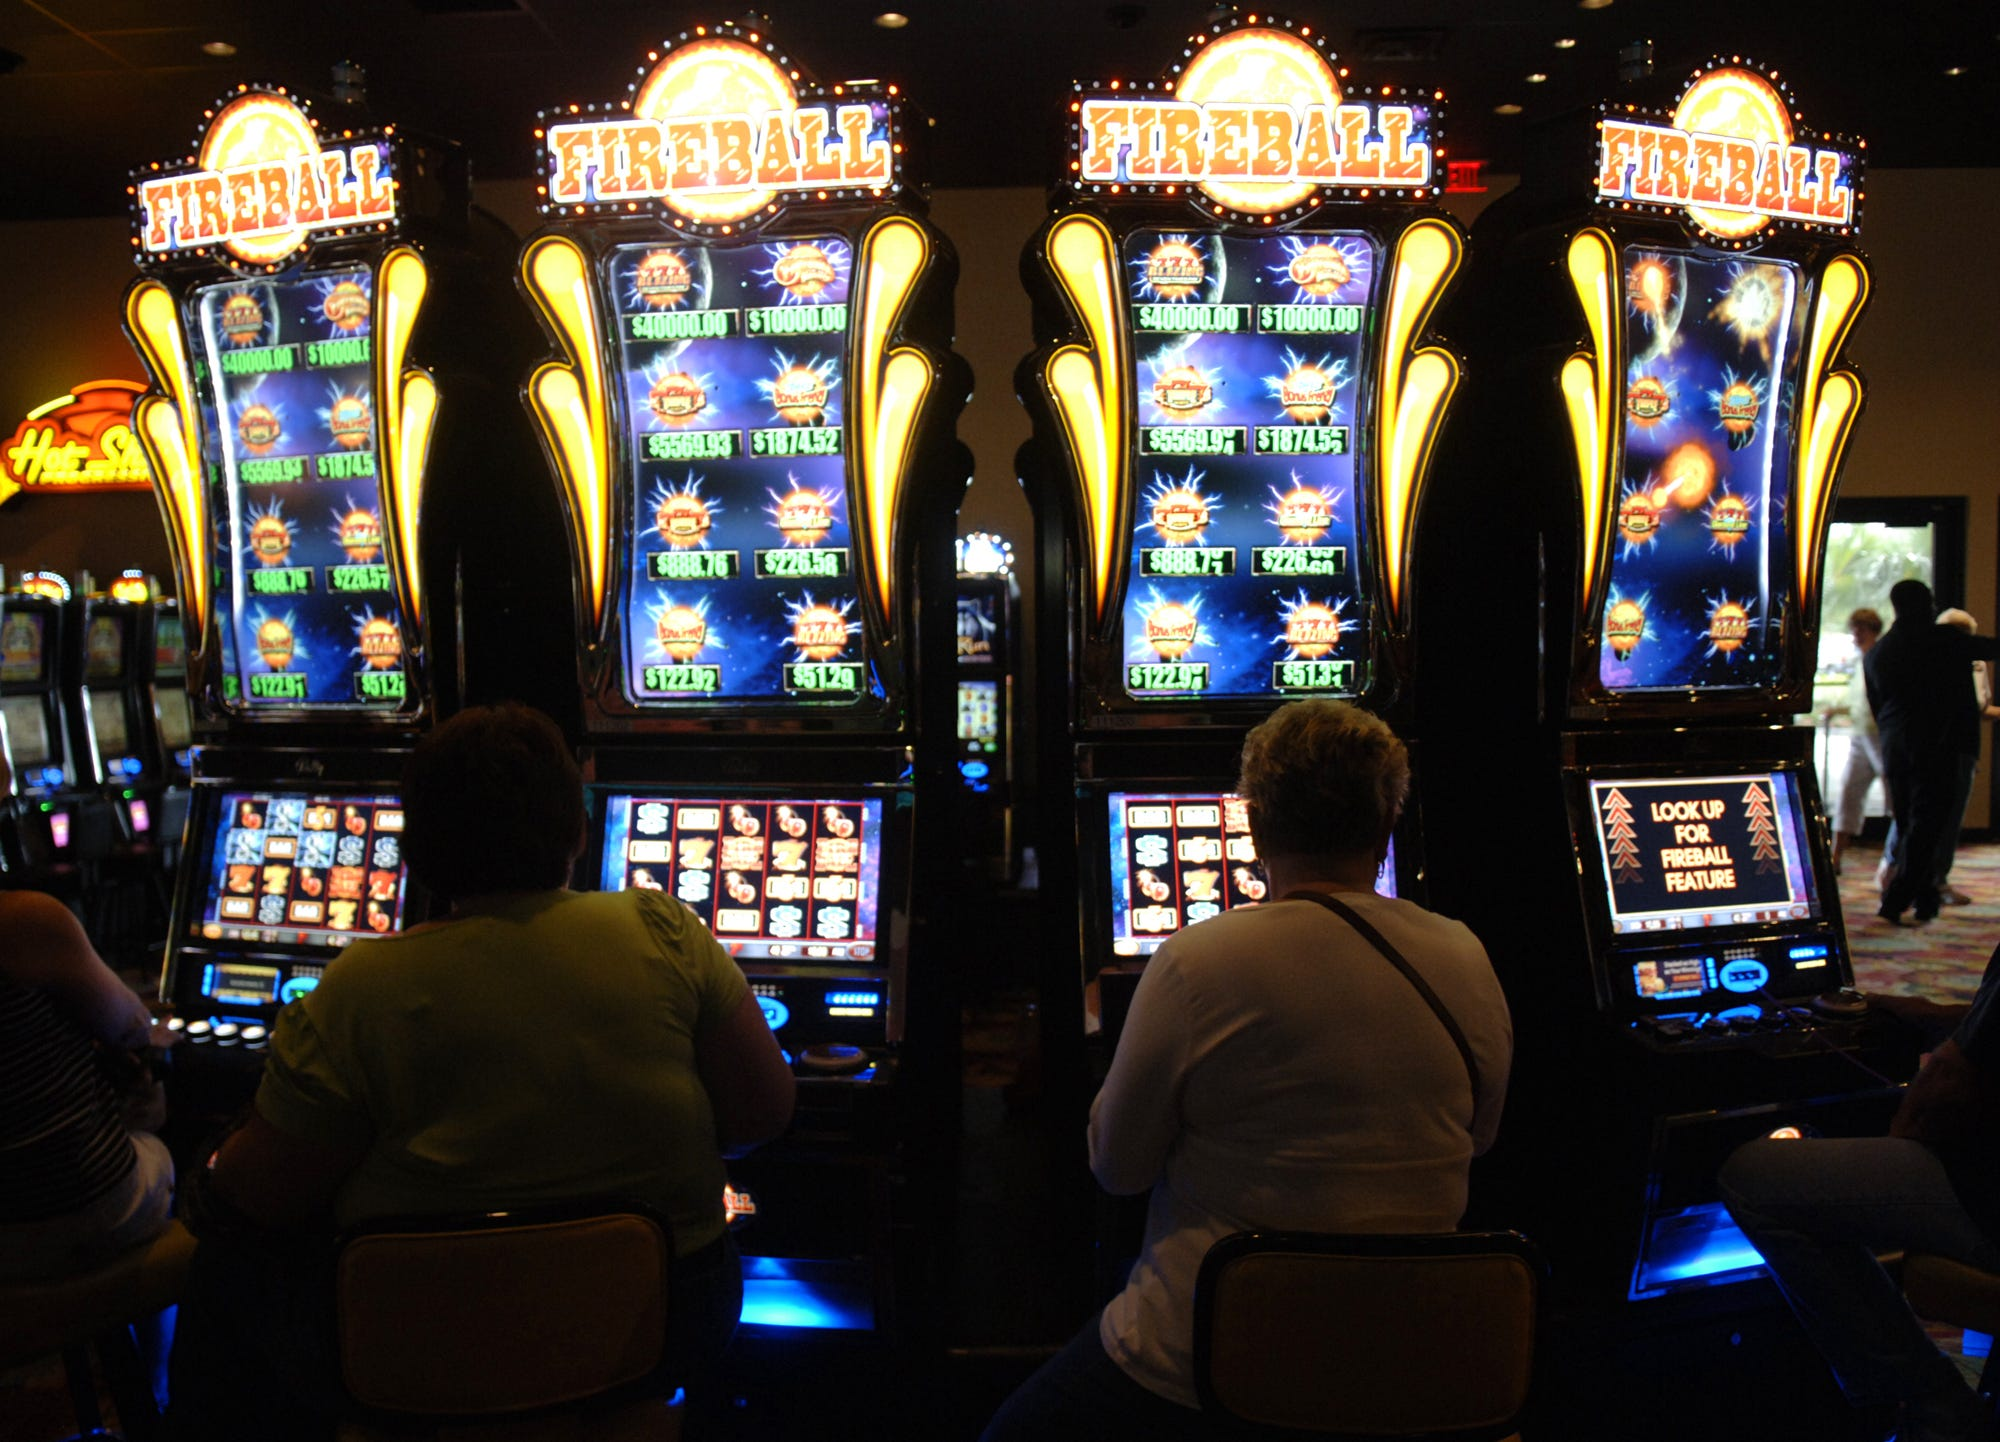 aladdin casino demolition